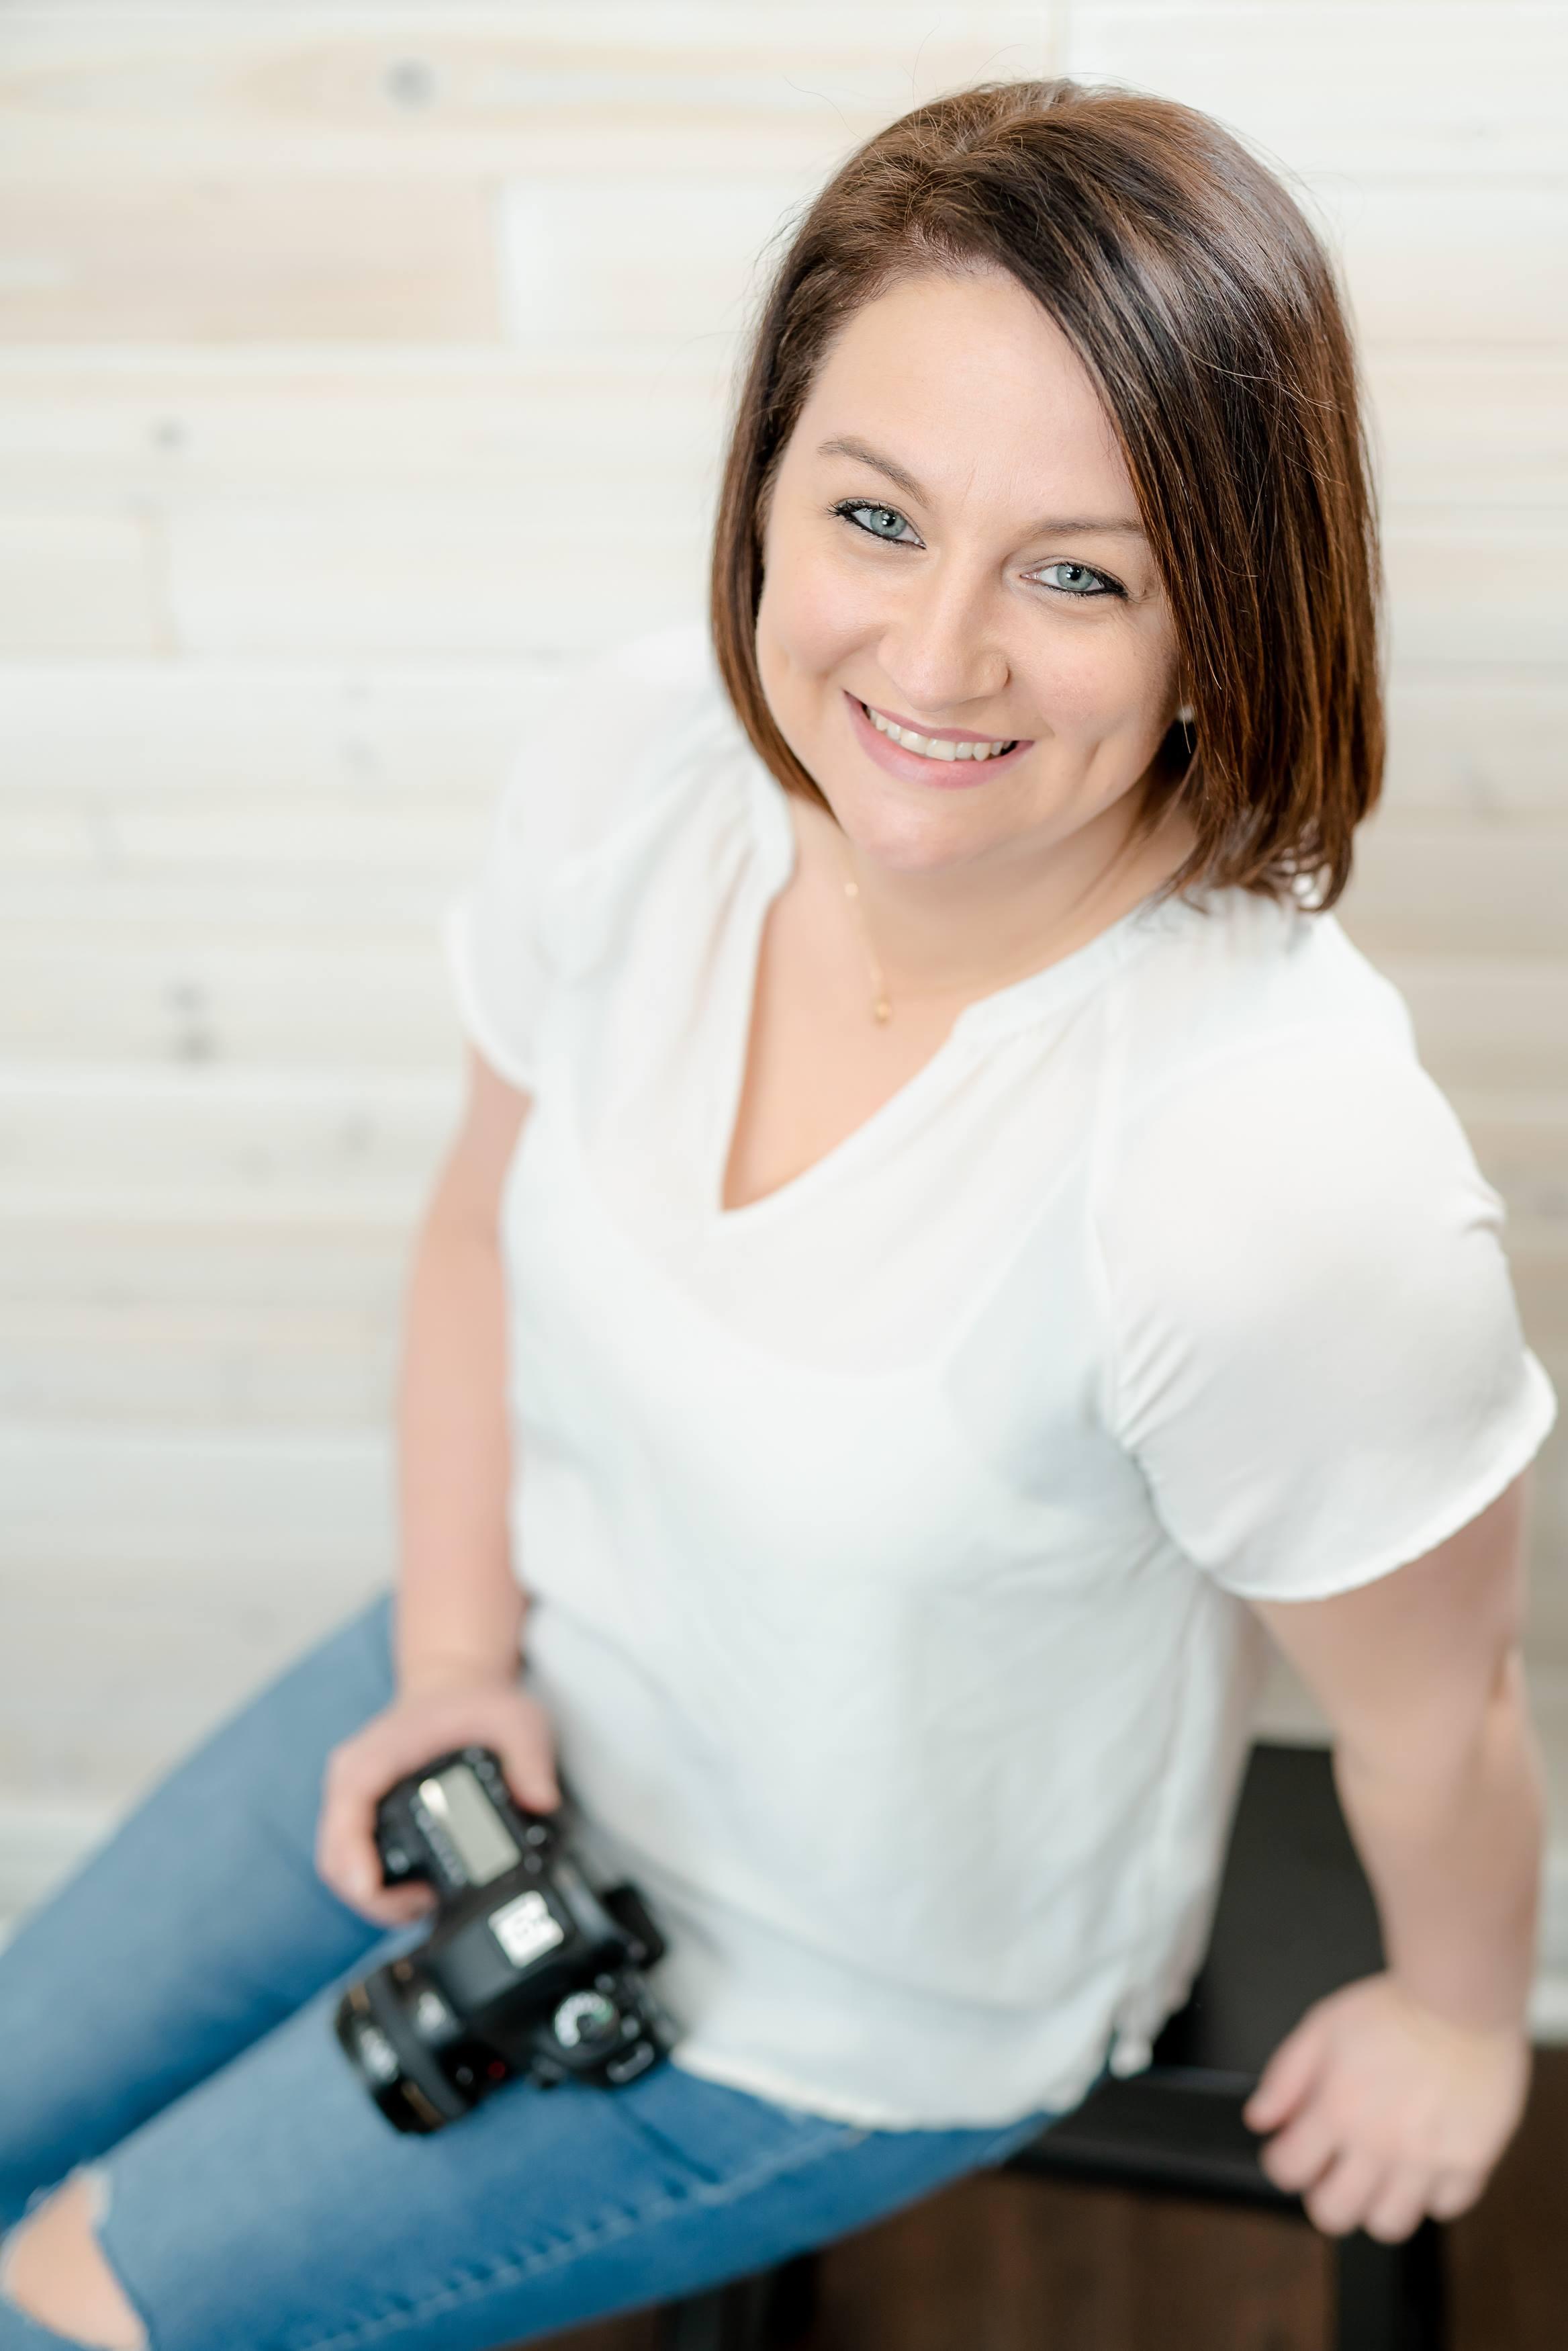 Deanna Kroll- Haeick - Photo Contributor